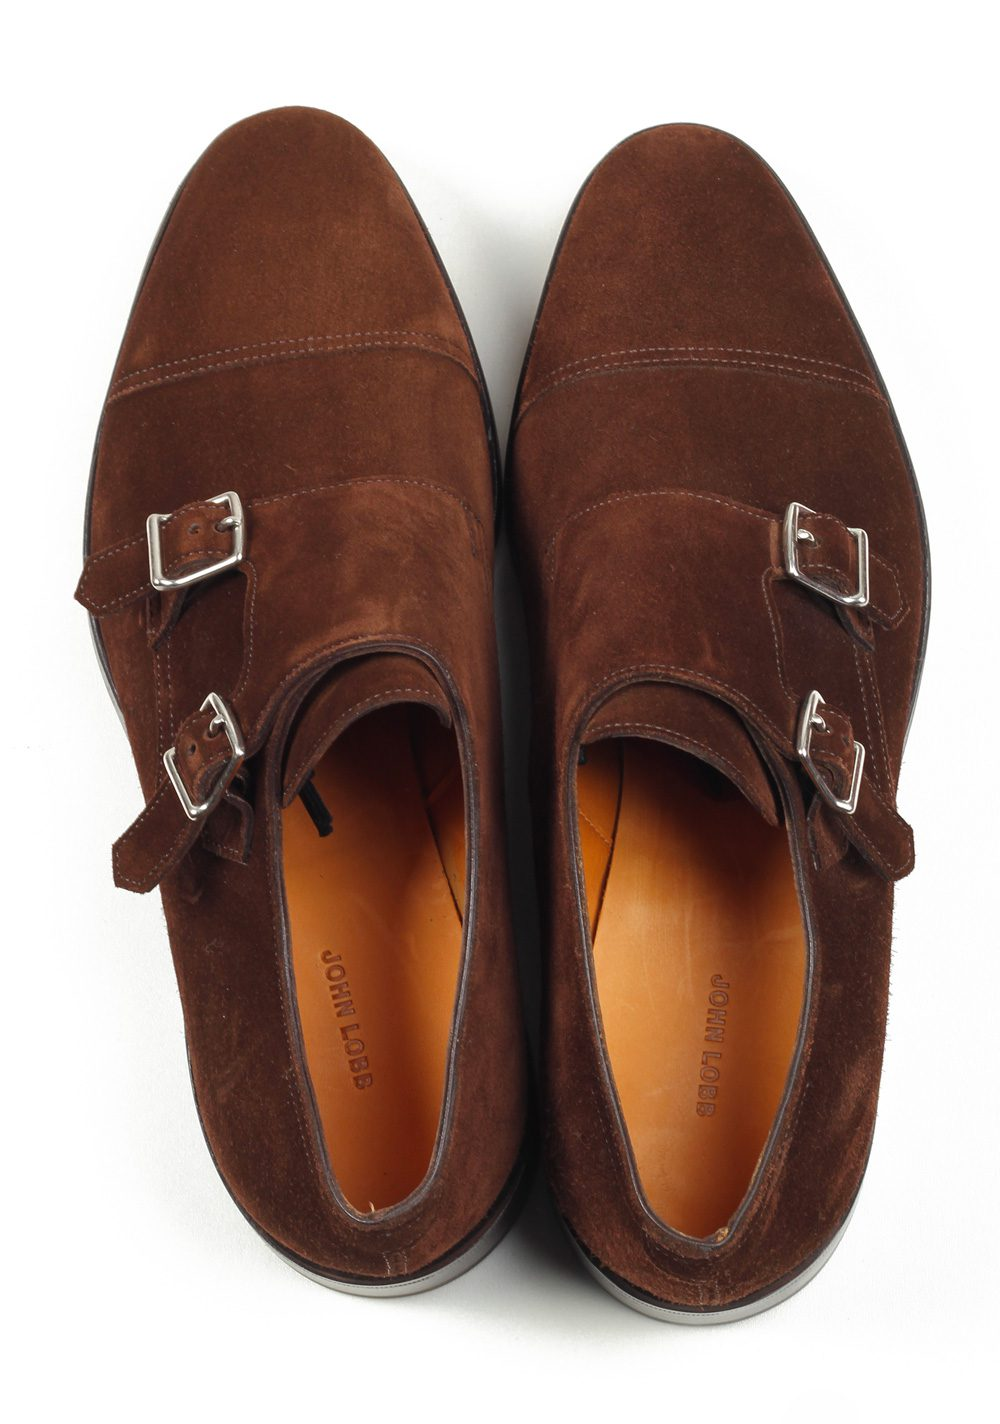 John Lobb William Brown Double Monk Strap Shoes Size 7,5 UK 8,5 U.S. On 9795 Last